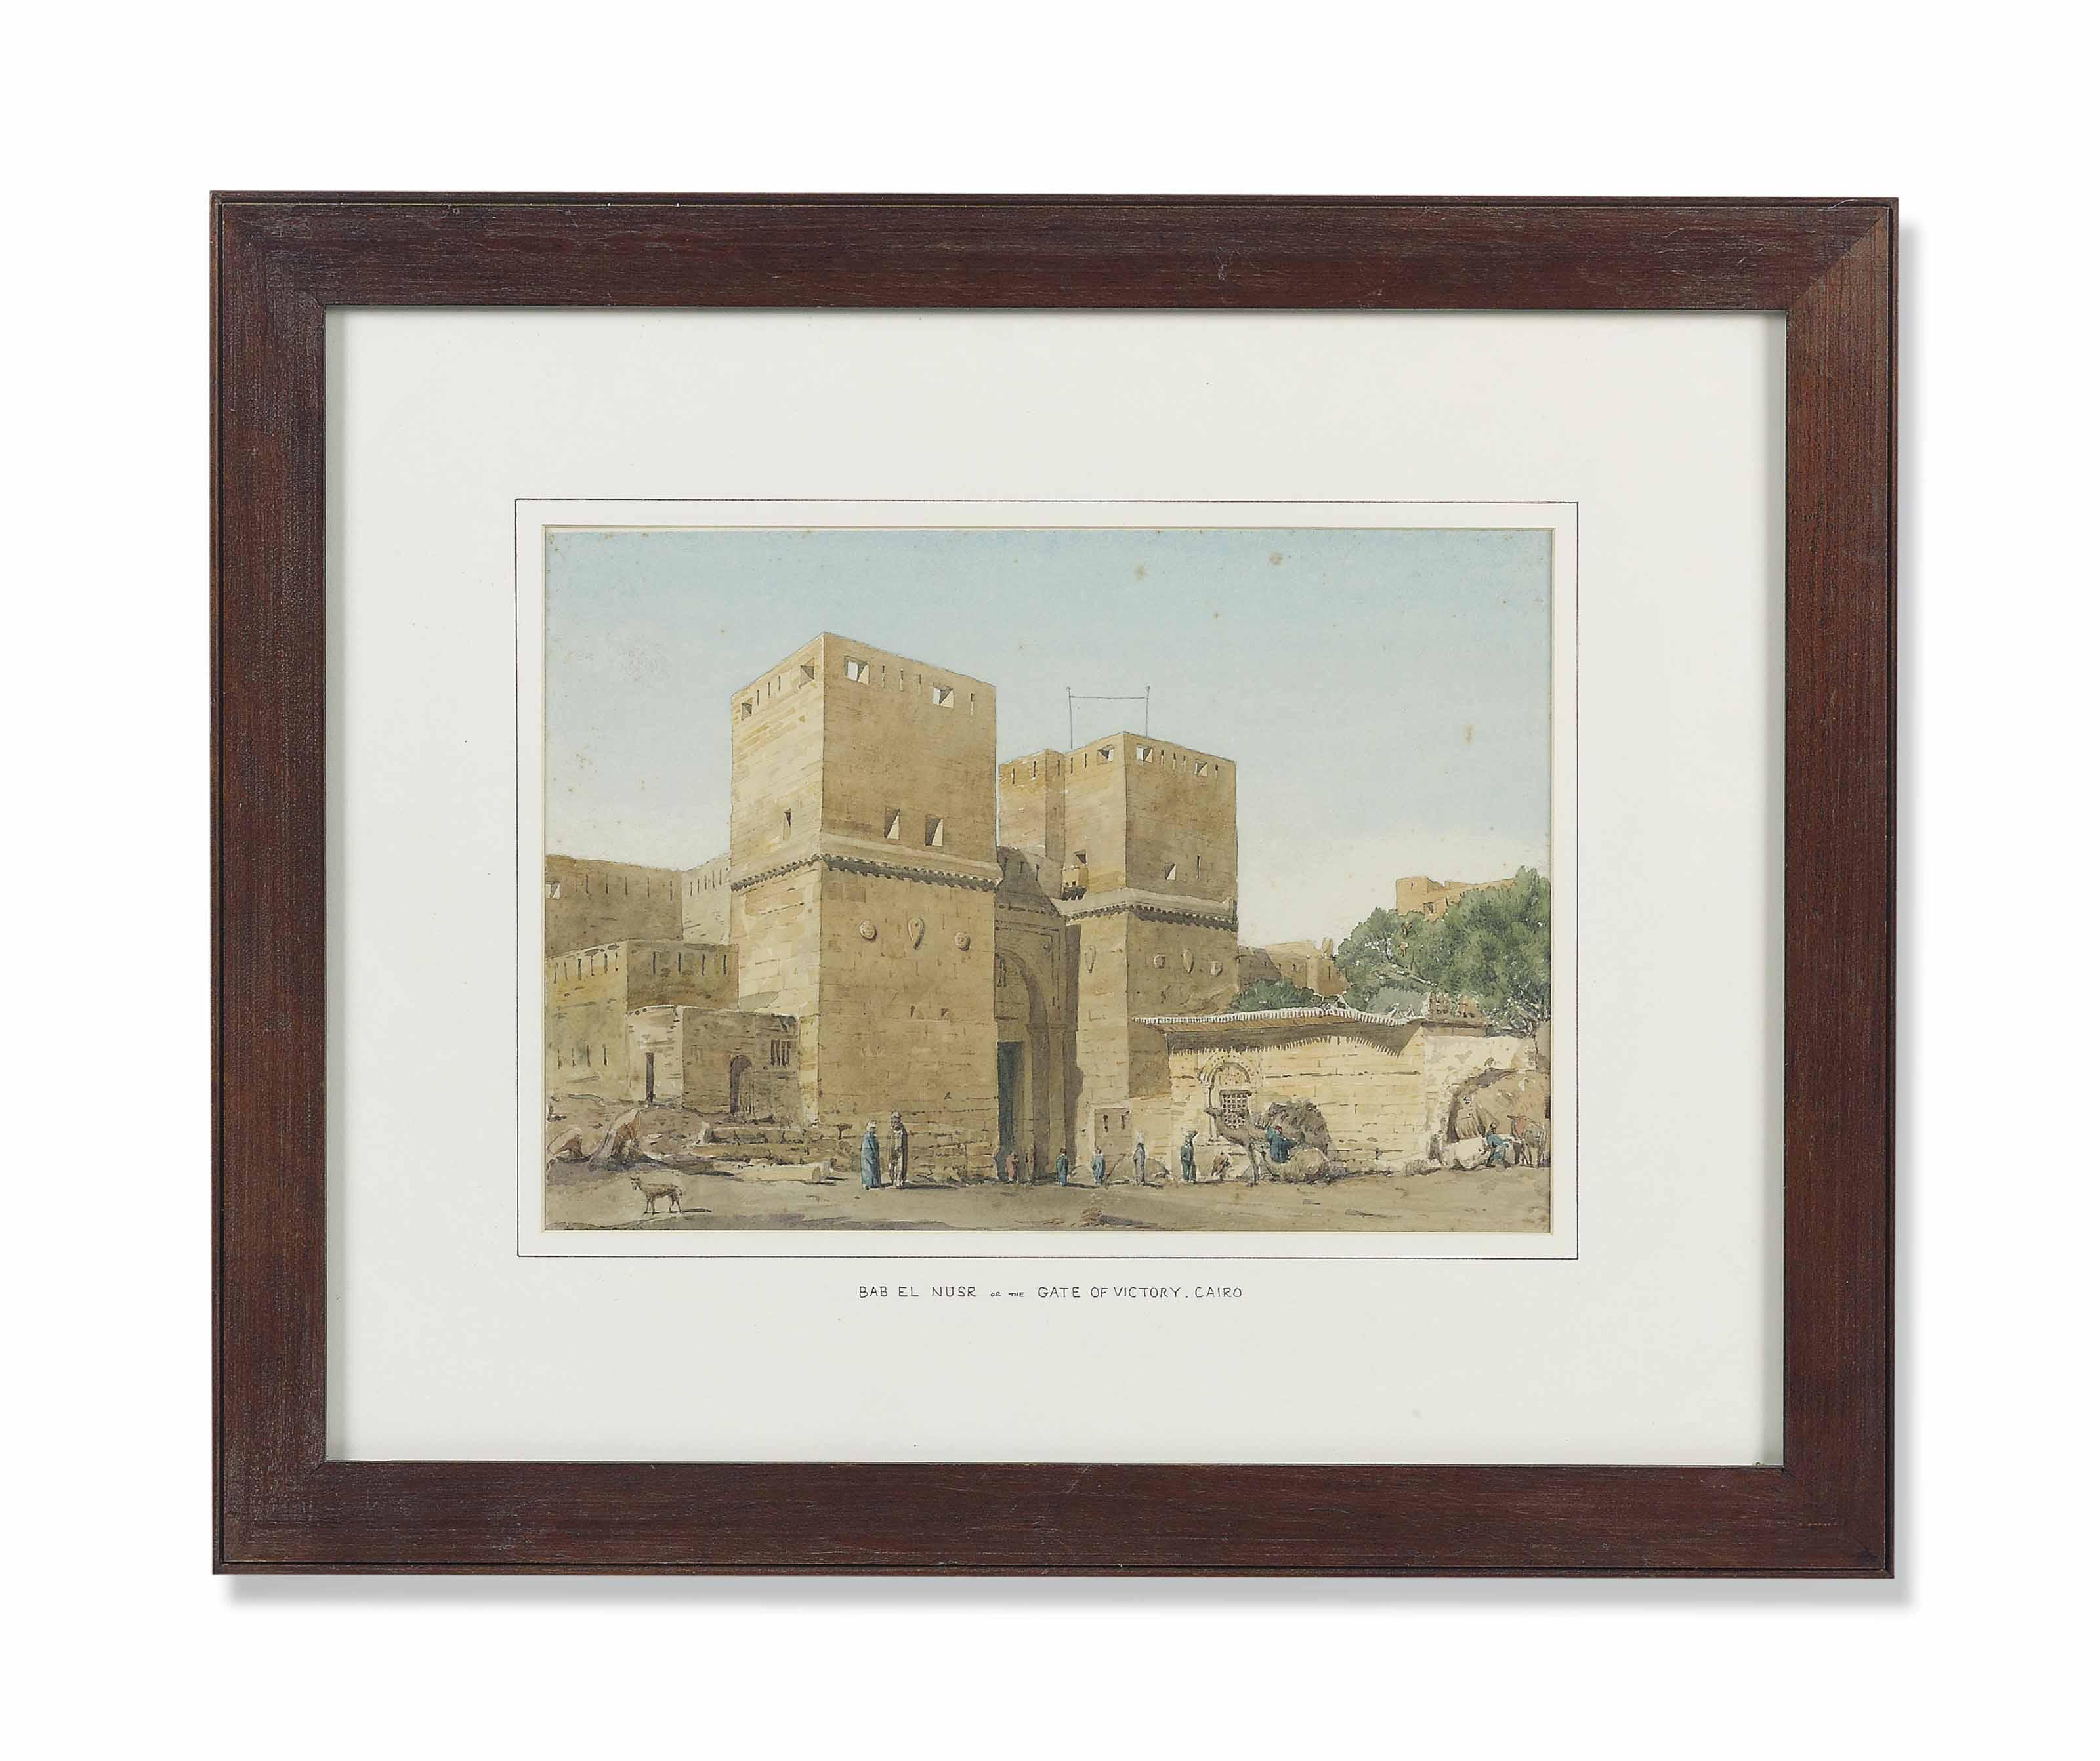 Bab al-Nusr, Cairo (Gate of Victory)